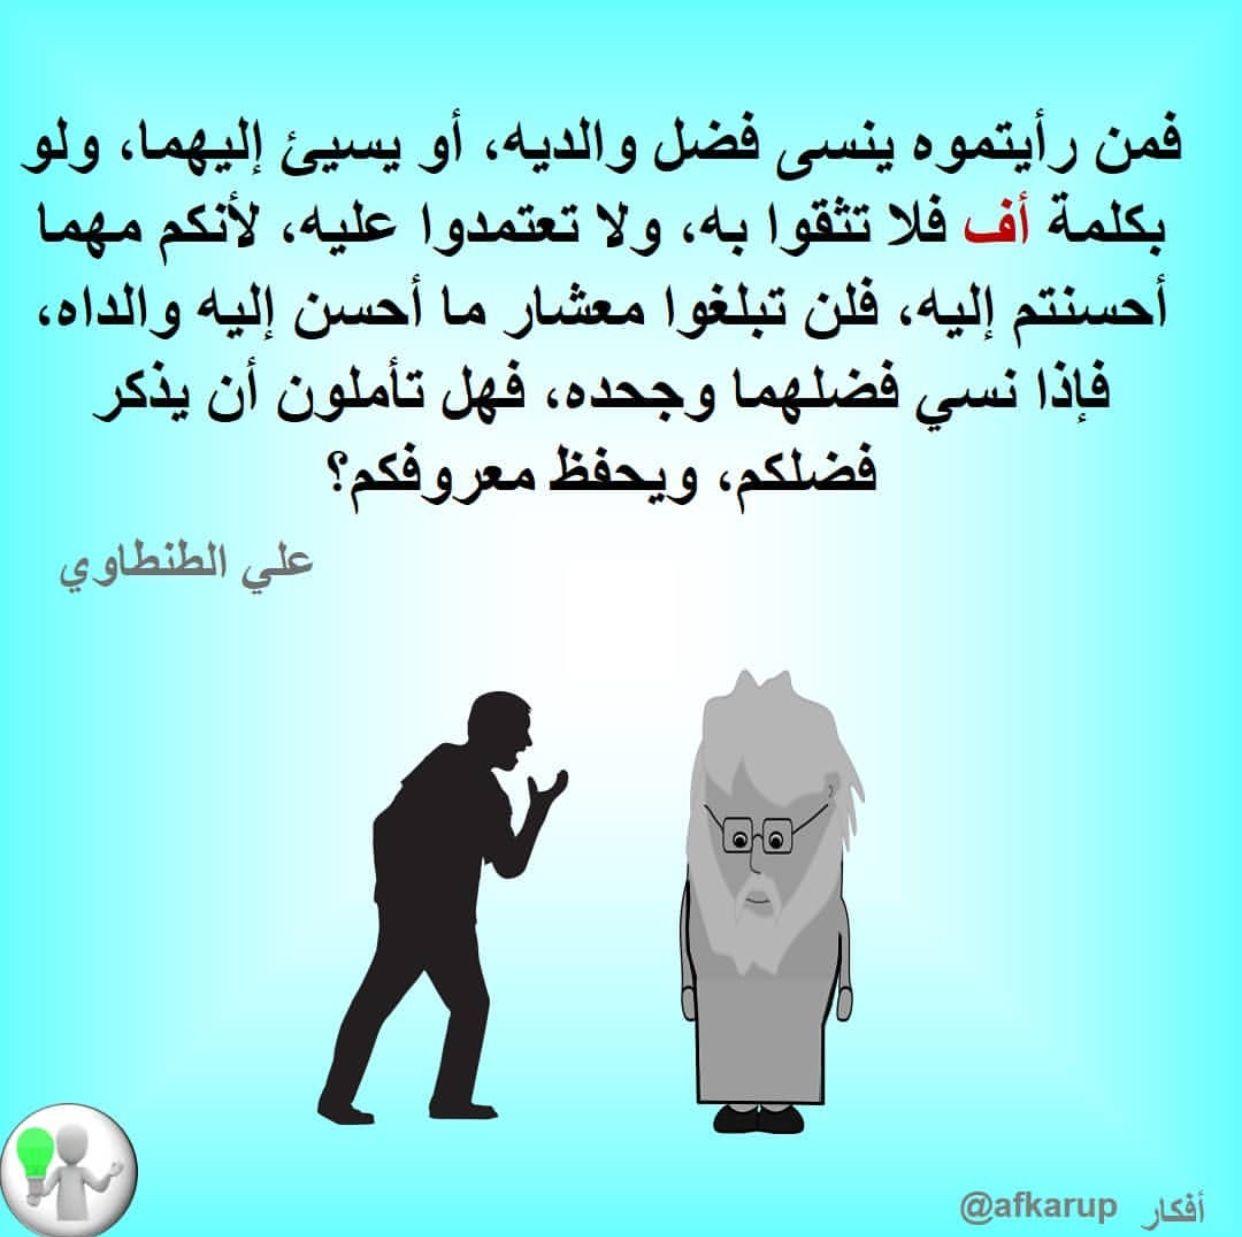 علي الطنطاوي Memes Ecard Meme Ecards